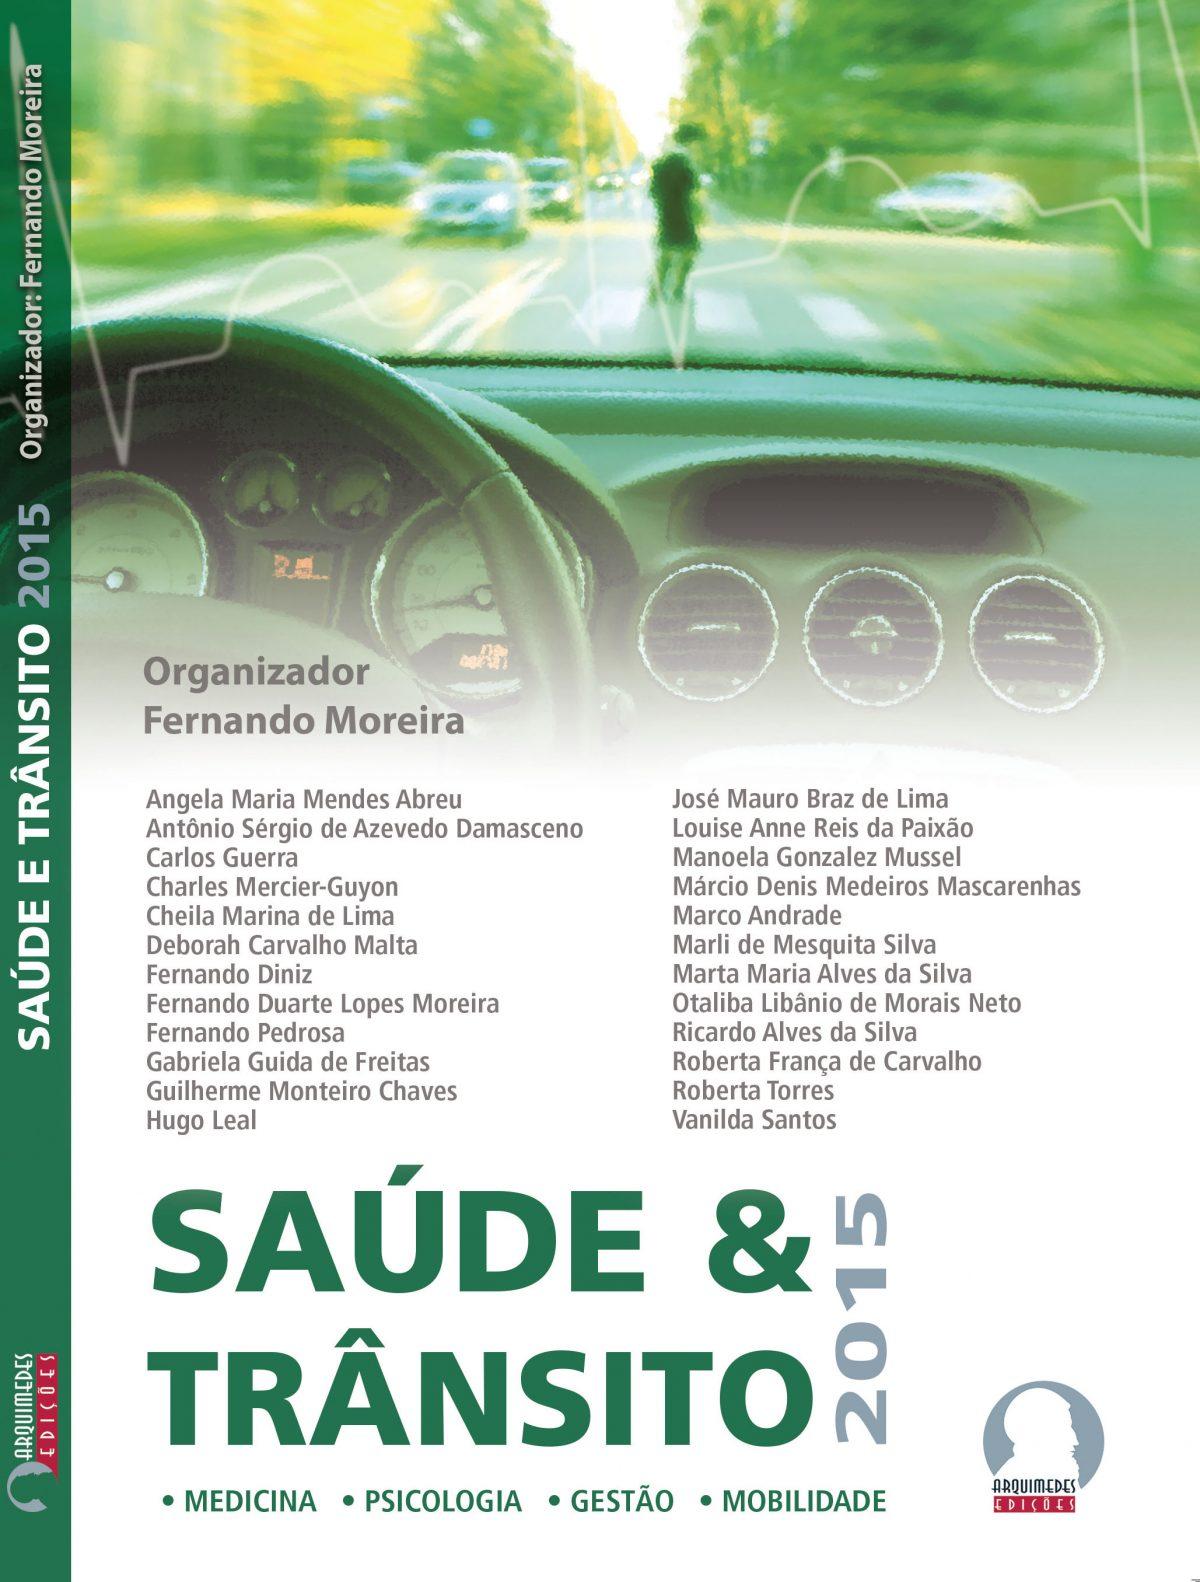 CAPA_Saúde e Transito 2015.indd